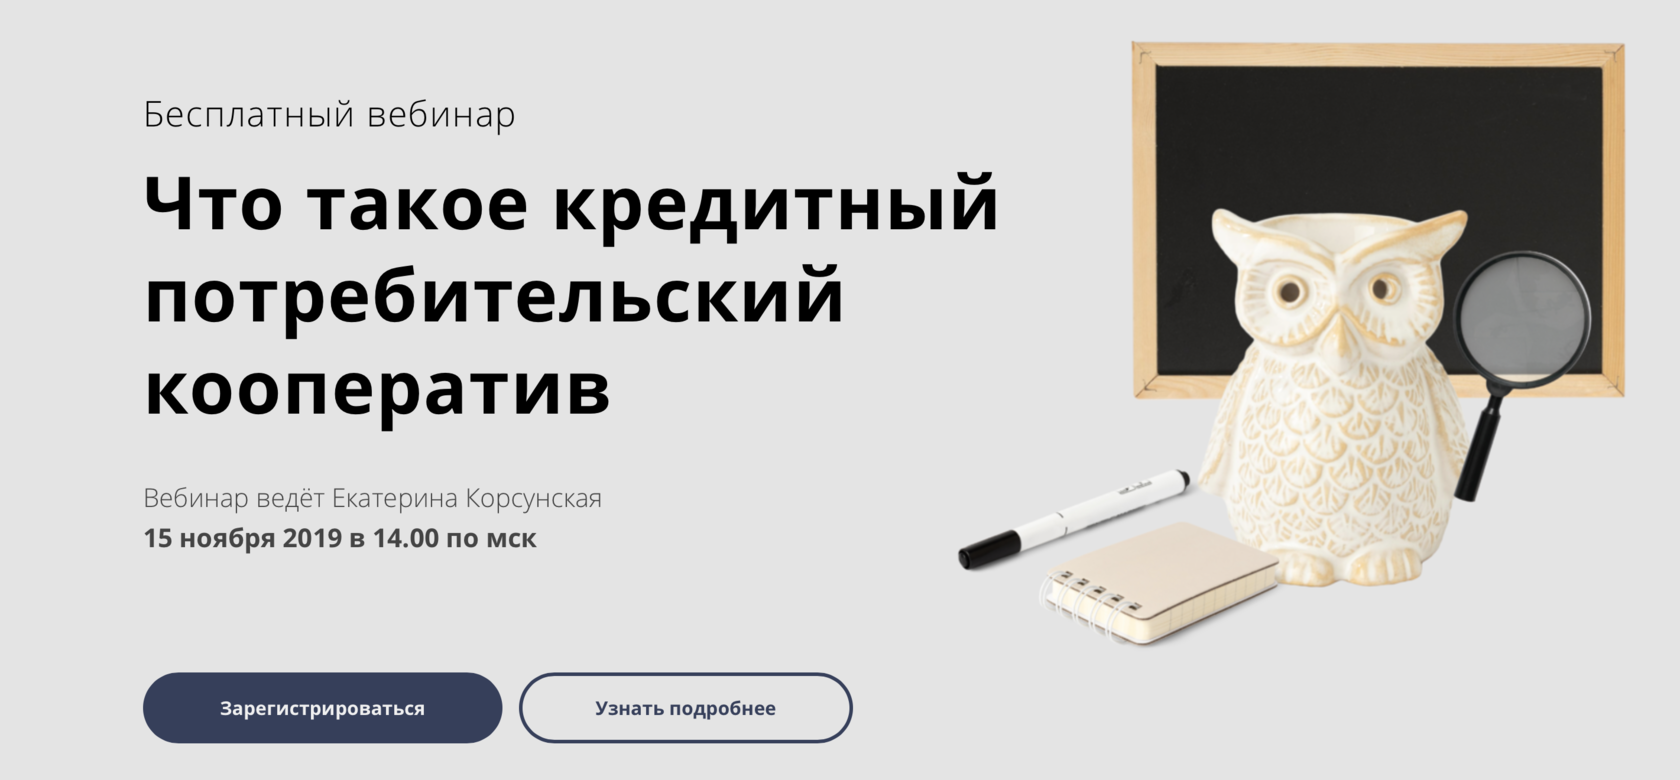 подача заявки во все банки сайт